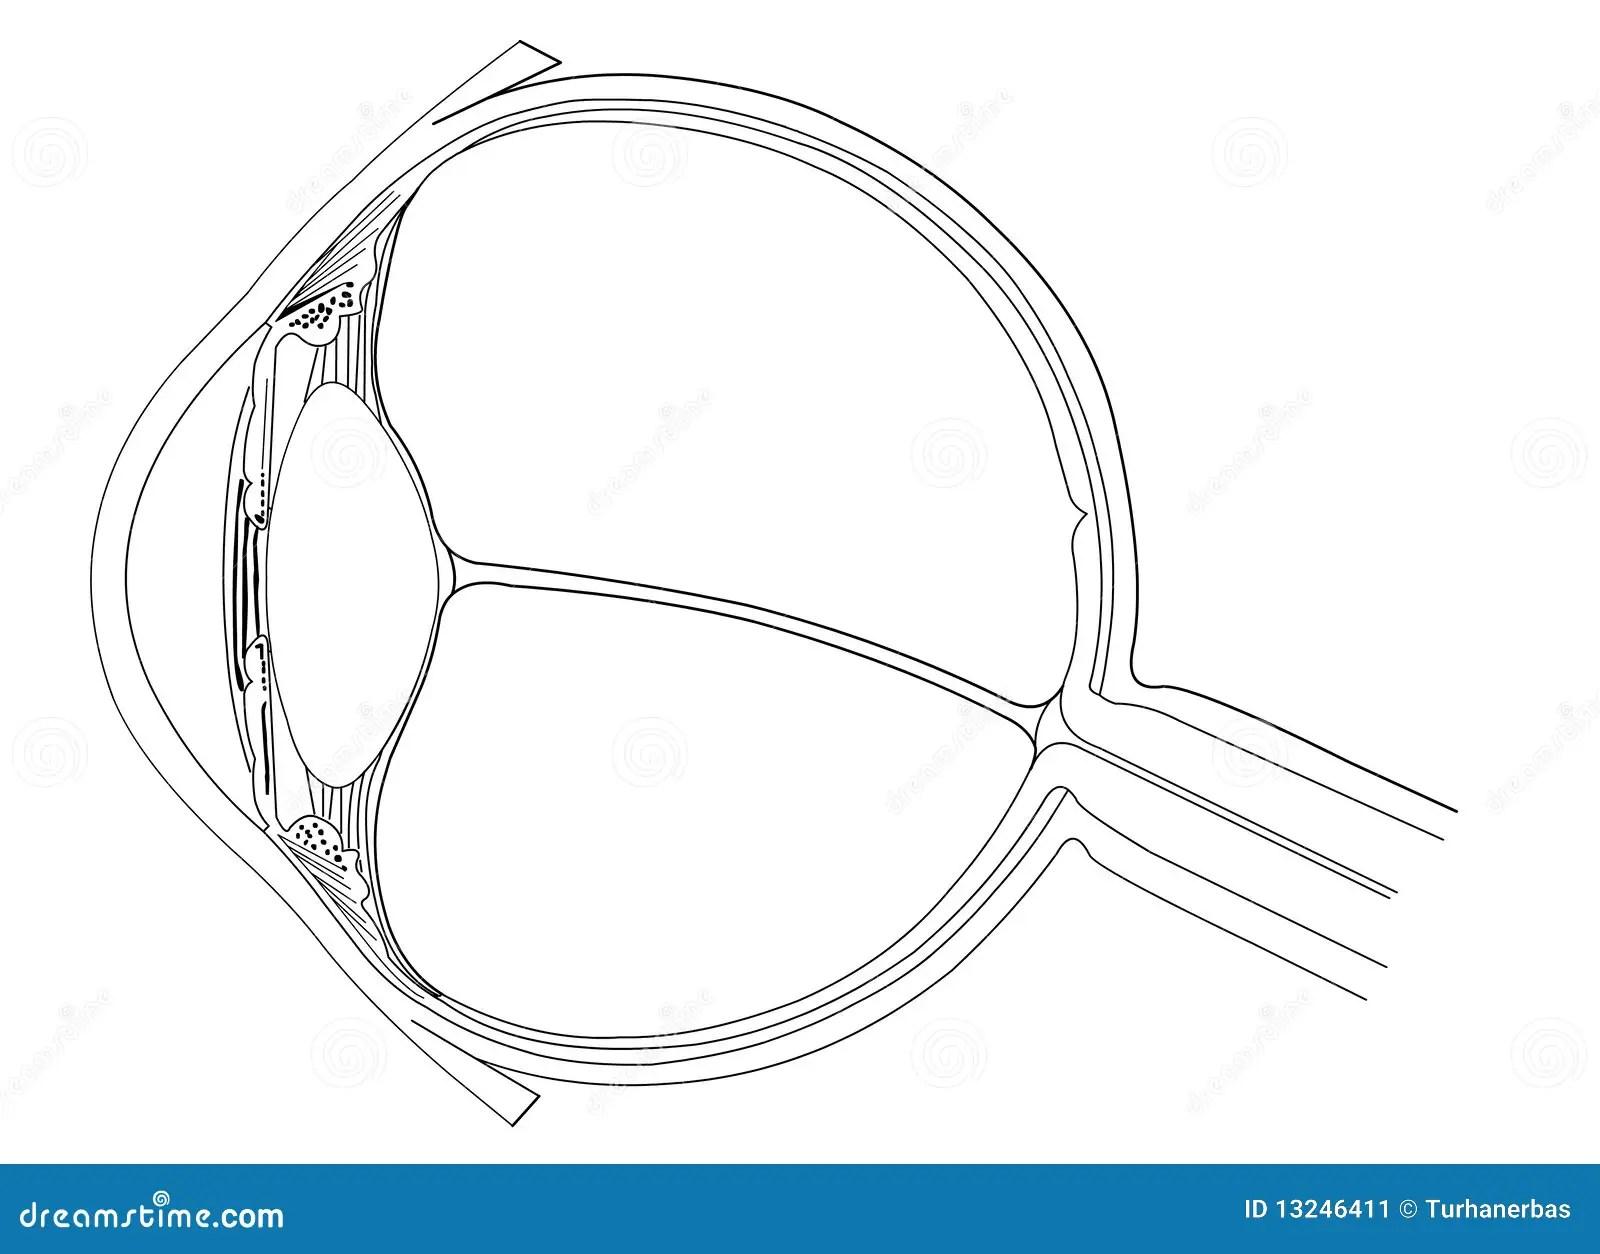 eye anatomy vintage diagram cell cycle blank worksheet stock vector illustration of circle nerve